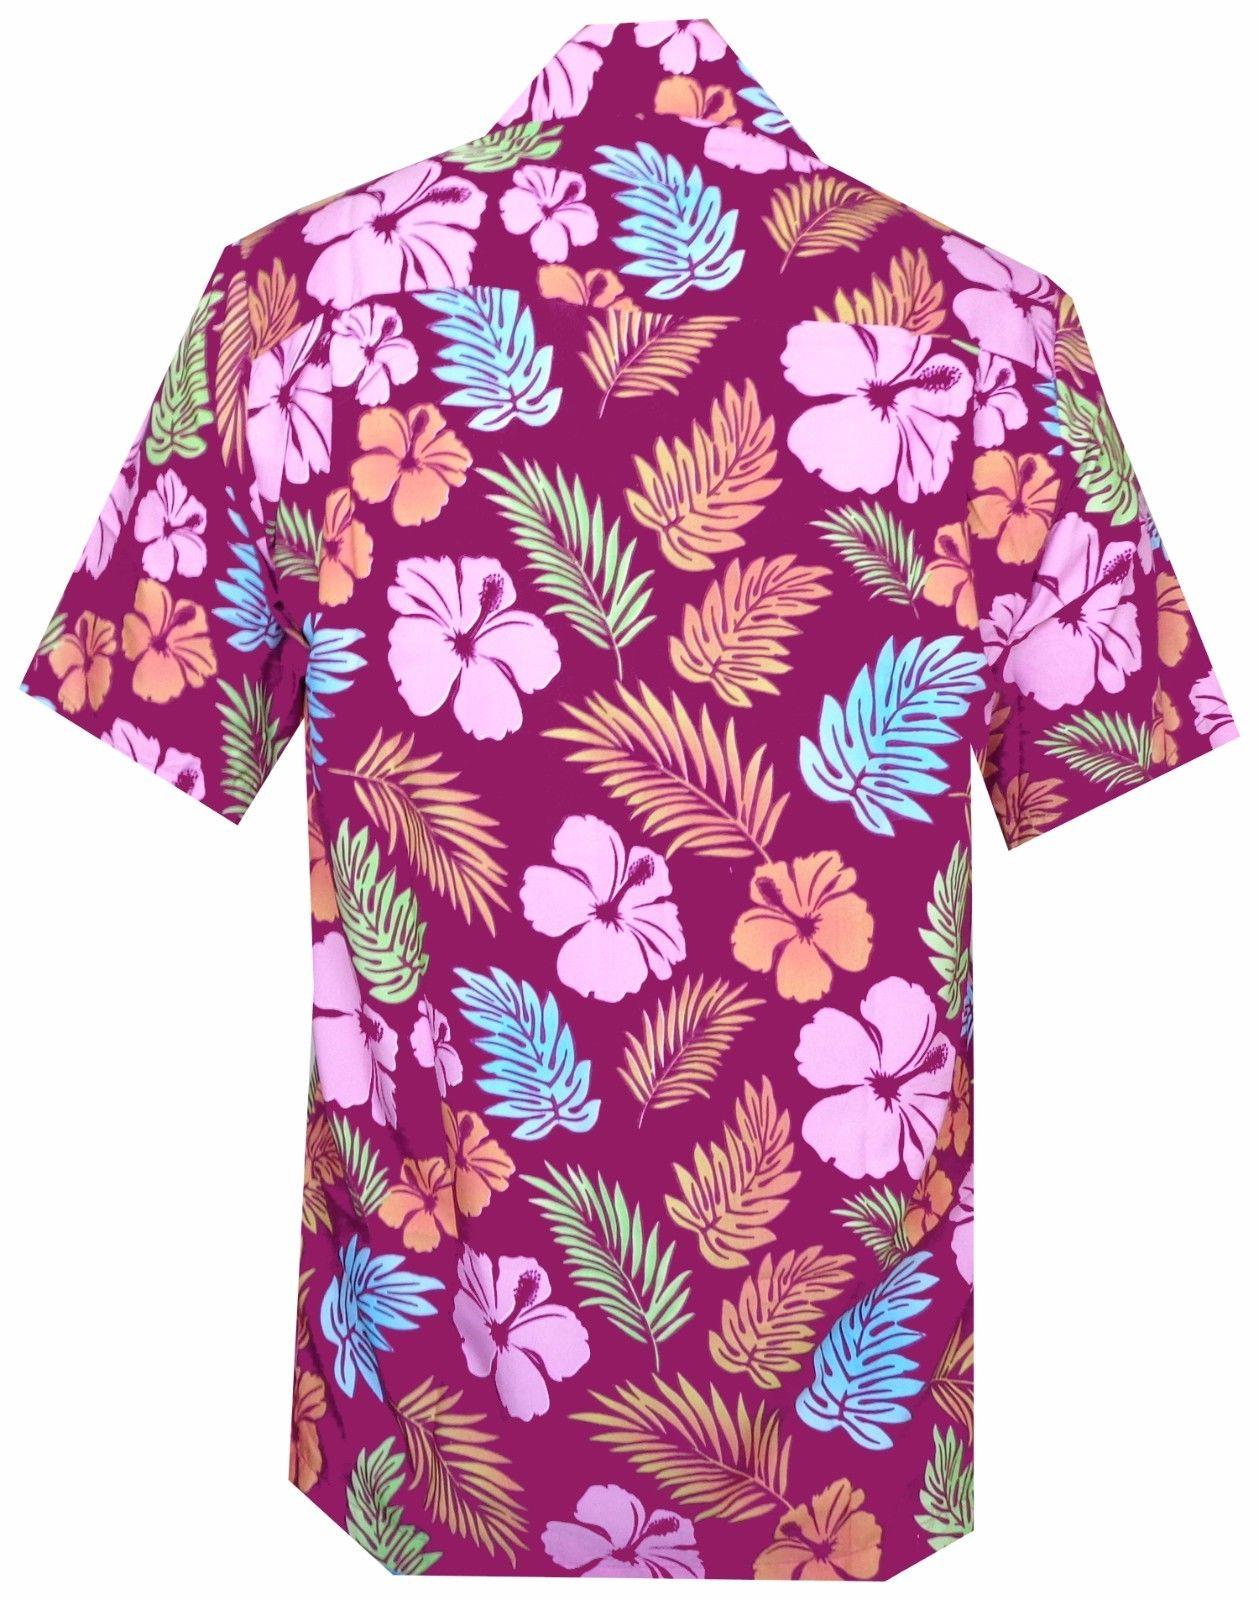 Hawaiian-Shirt-Mens-Hibiscus-Floral-Leaf-Print-Beach-Aloha-Camp-Party thumbnail 8